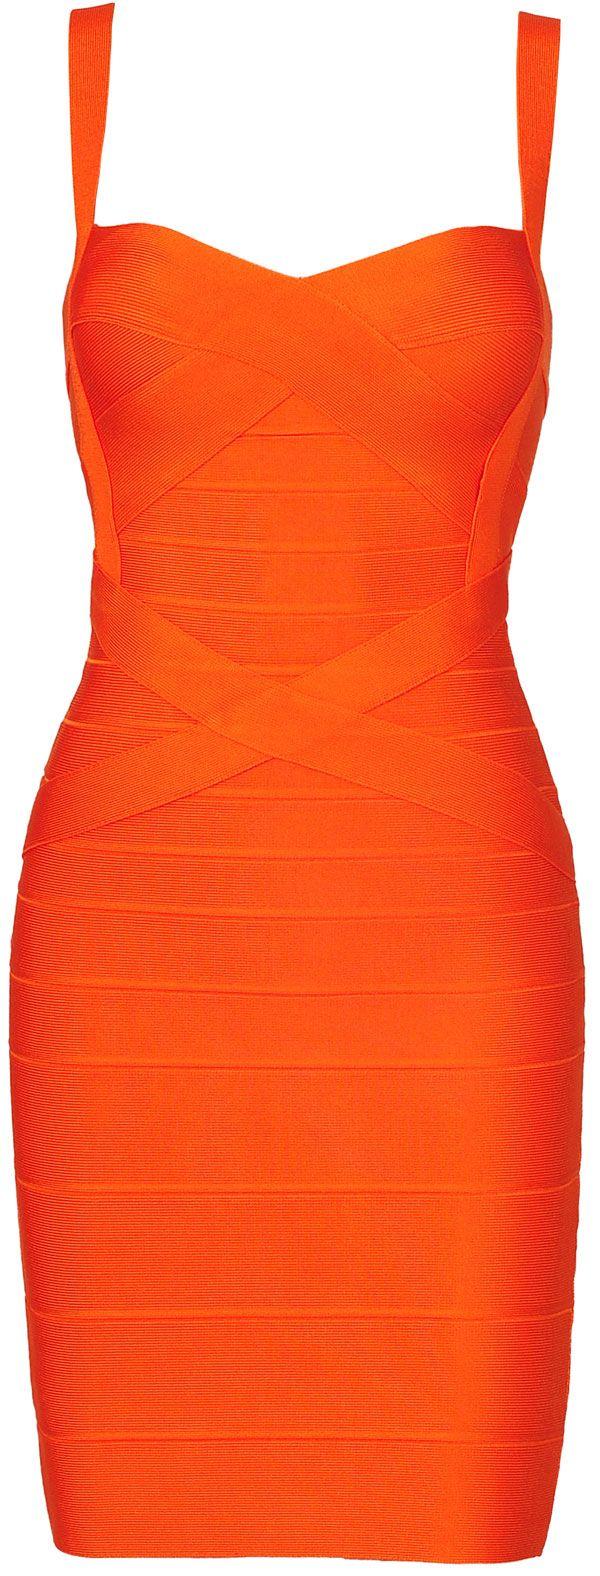 Clothing :: Dresses :: Bandage Dresses :: 'Sunset' Orange Strappy Bandage Bodycon Dress - Inspired by Beyonce - Celeb Boutique - Celebrity Style At High Street Prices| Bodycon Dresses | Bandage Dresses | Party Dresses